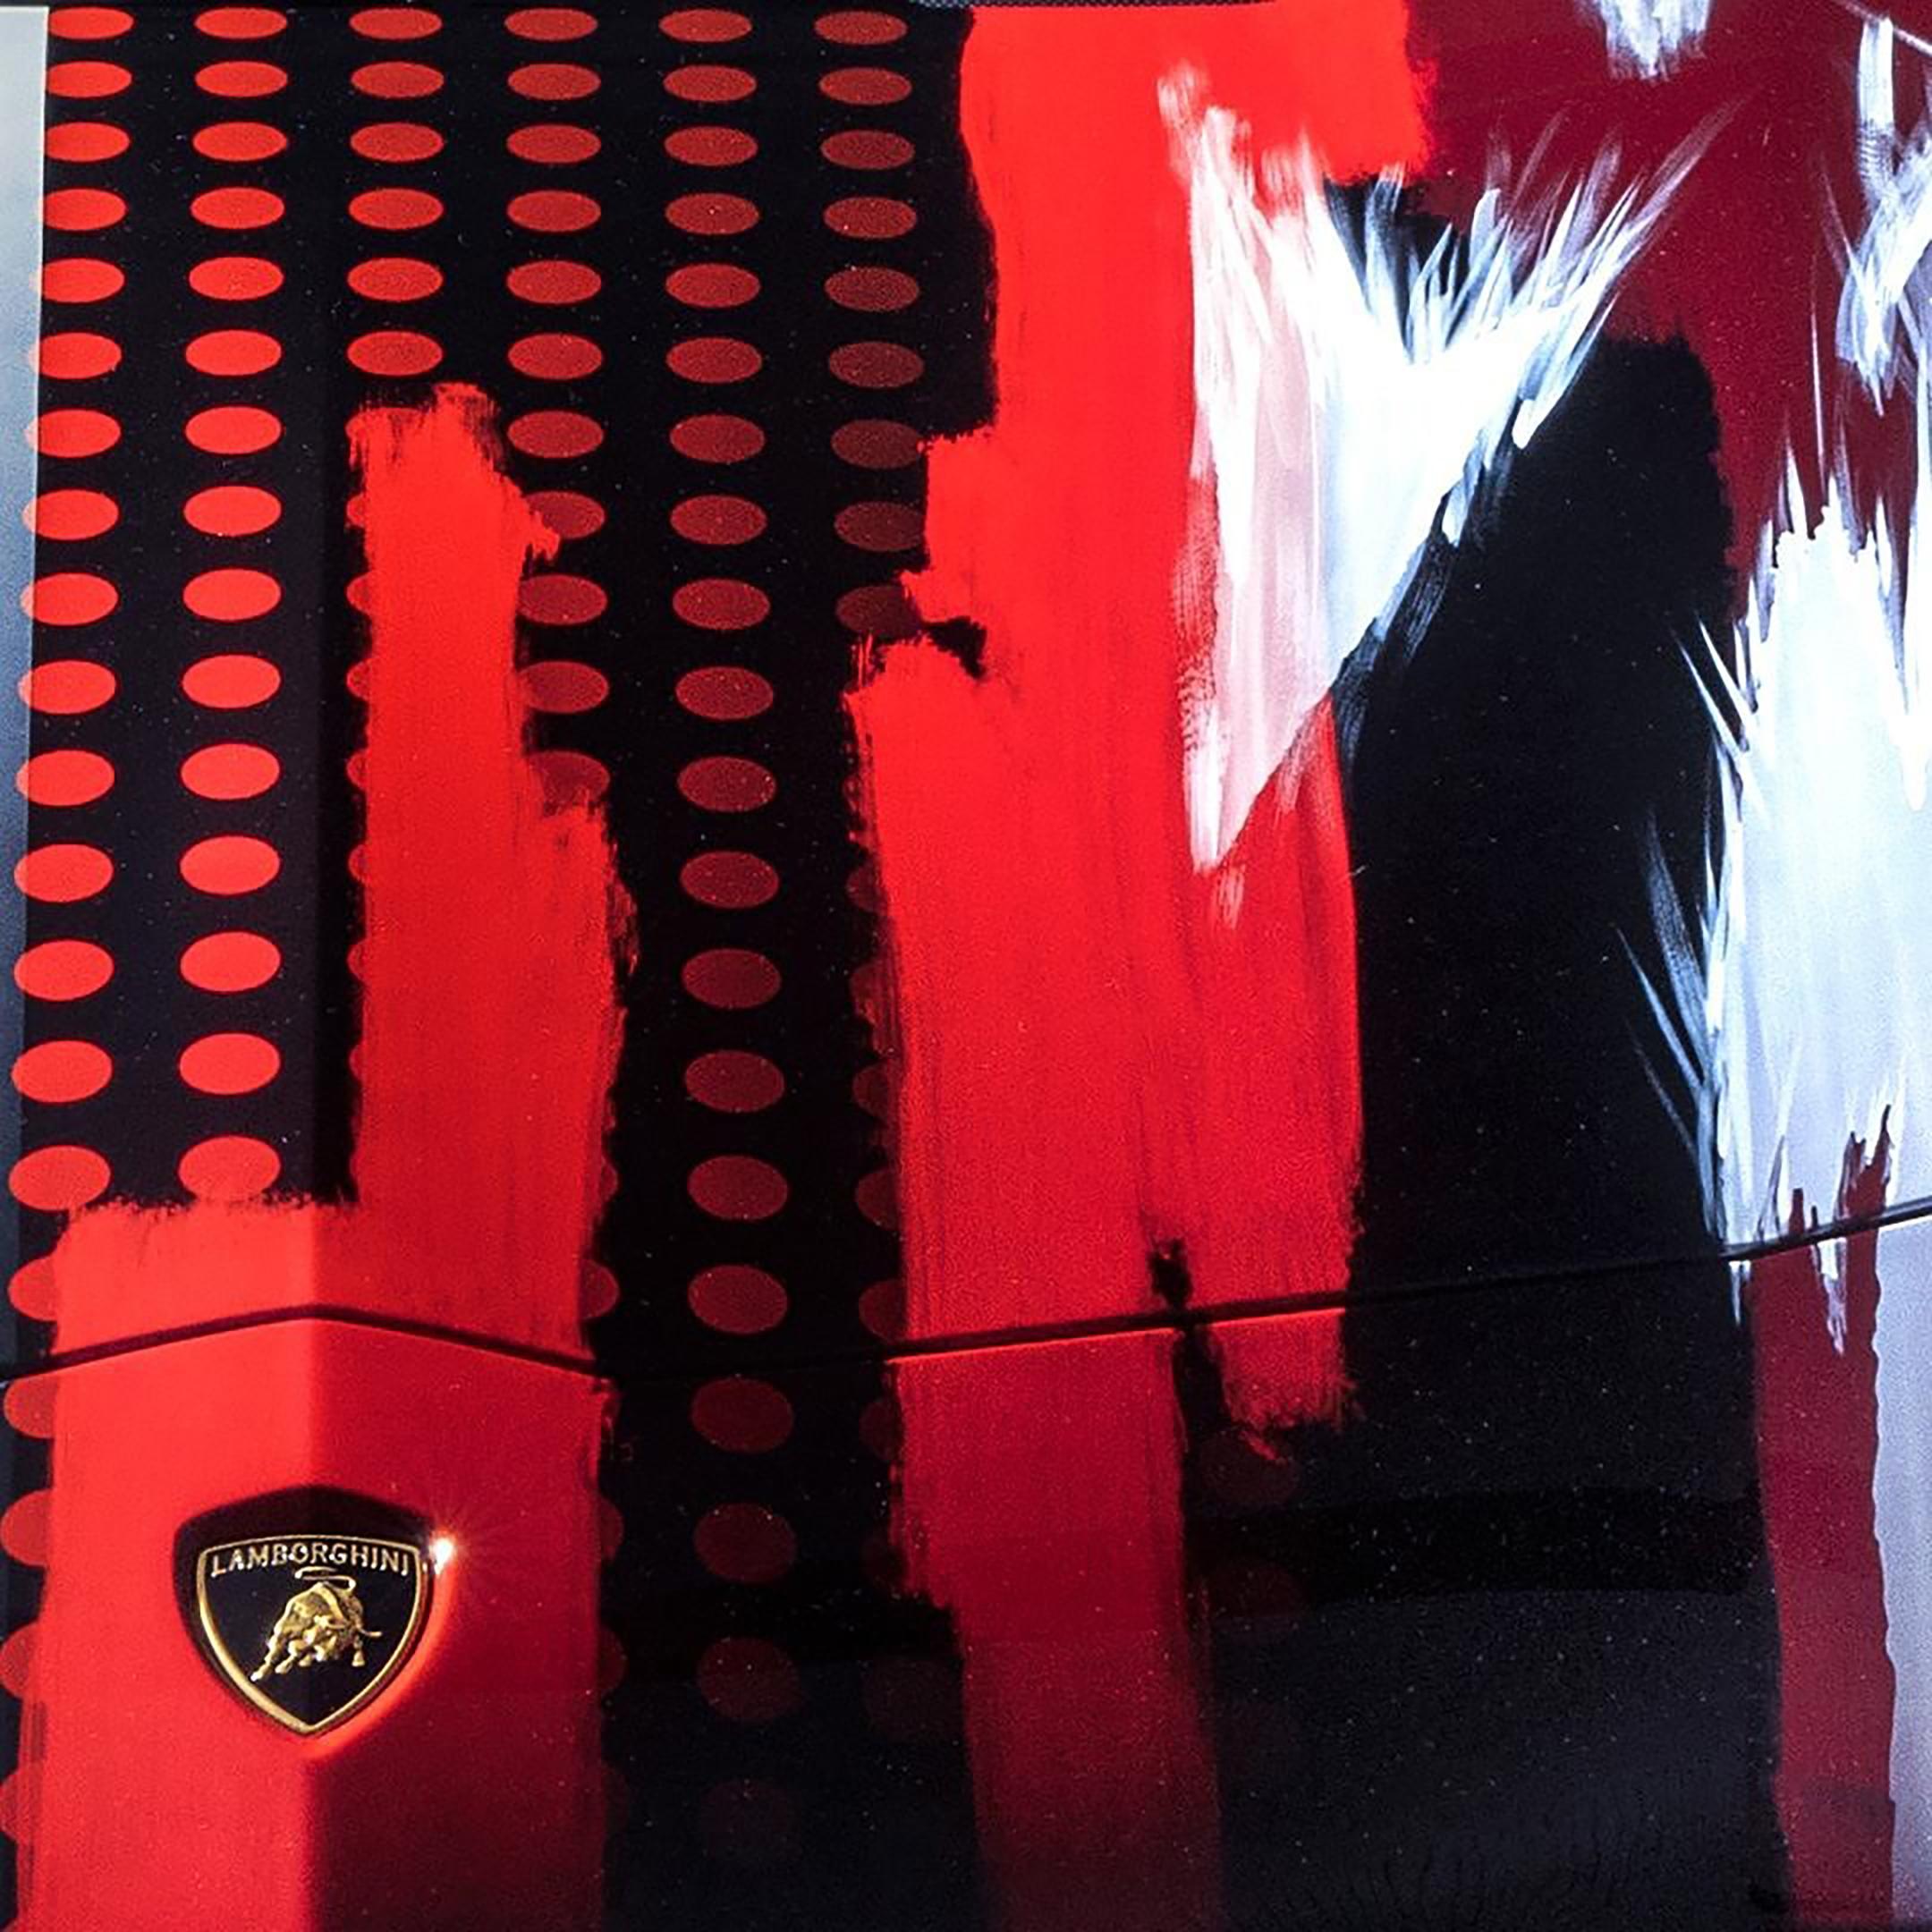 Lamborghini Aventador S x Yohji Yamamoto fashion designer - 2020 - hood artwork - preview